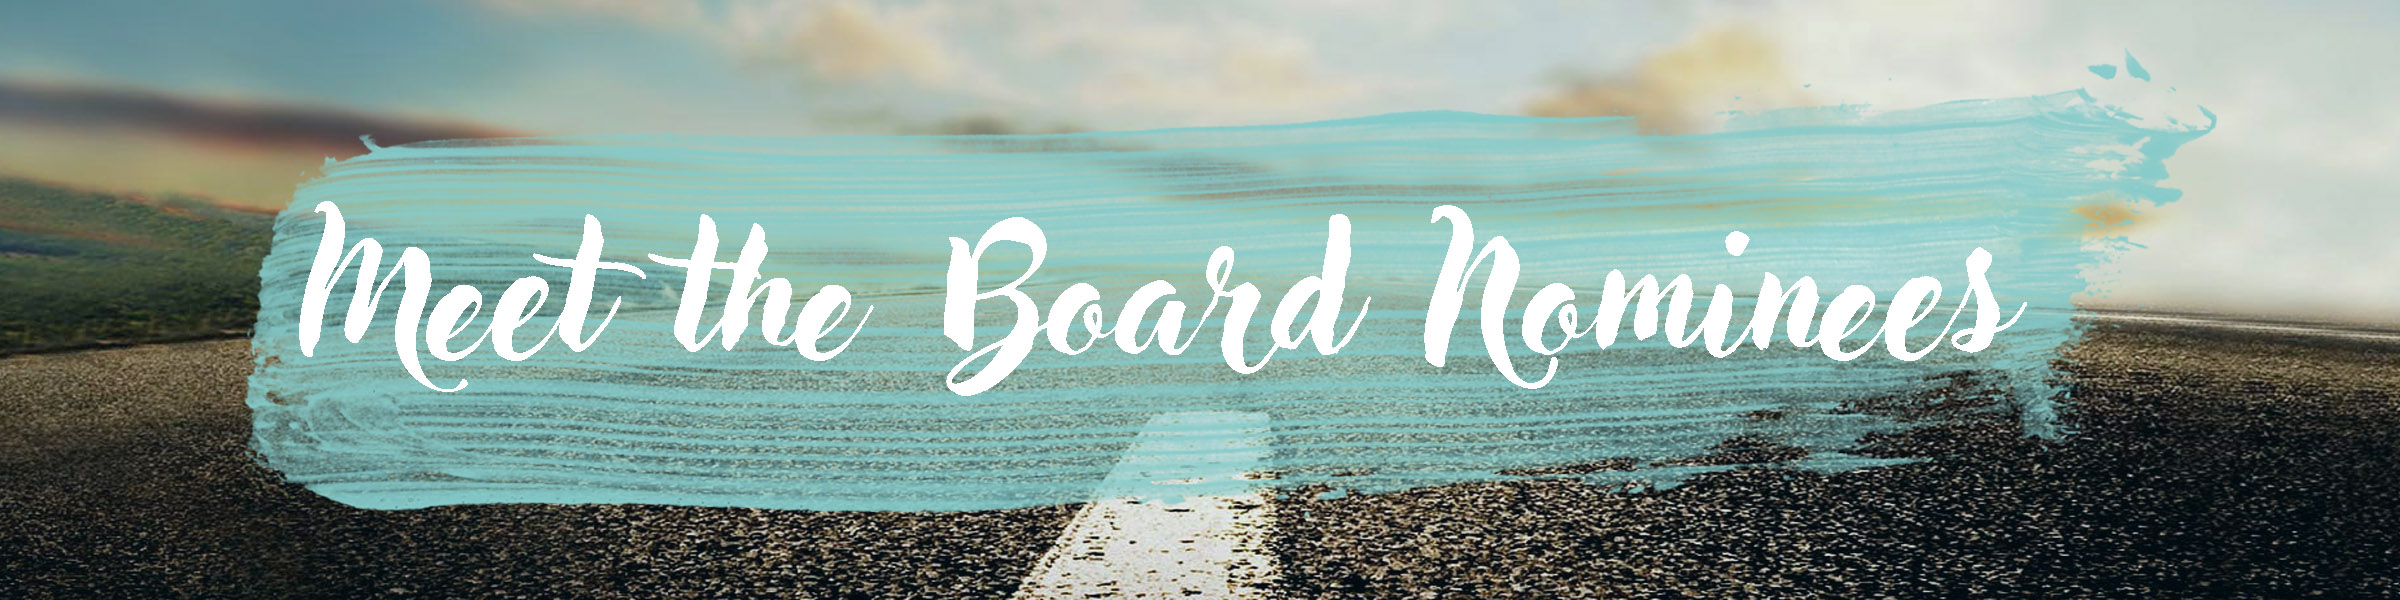 Board Nominees.jpg